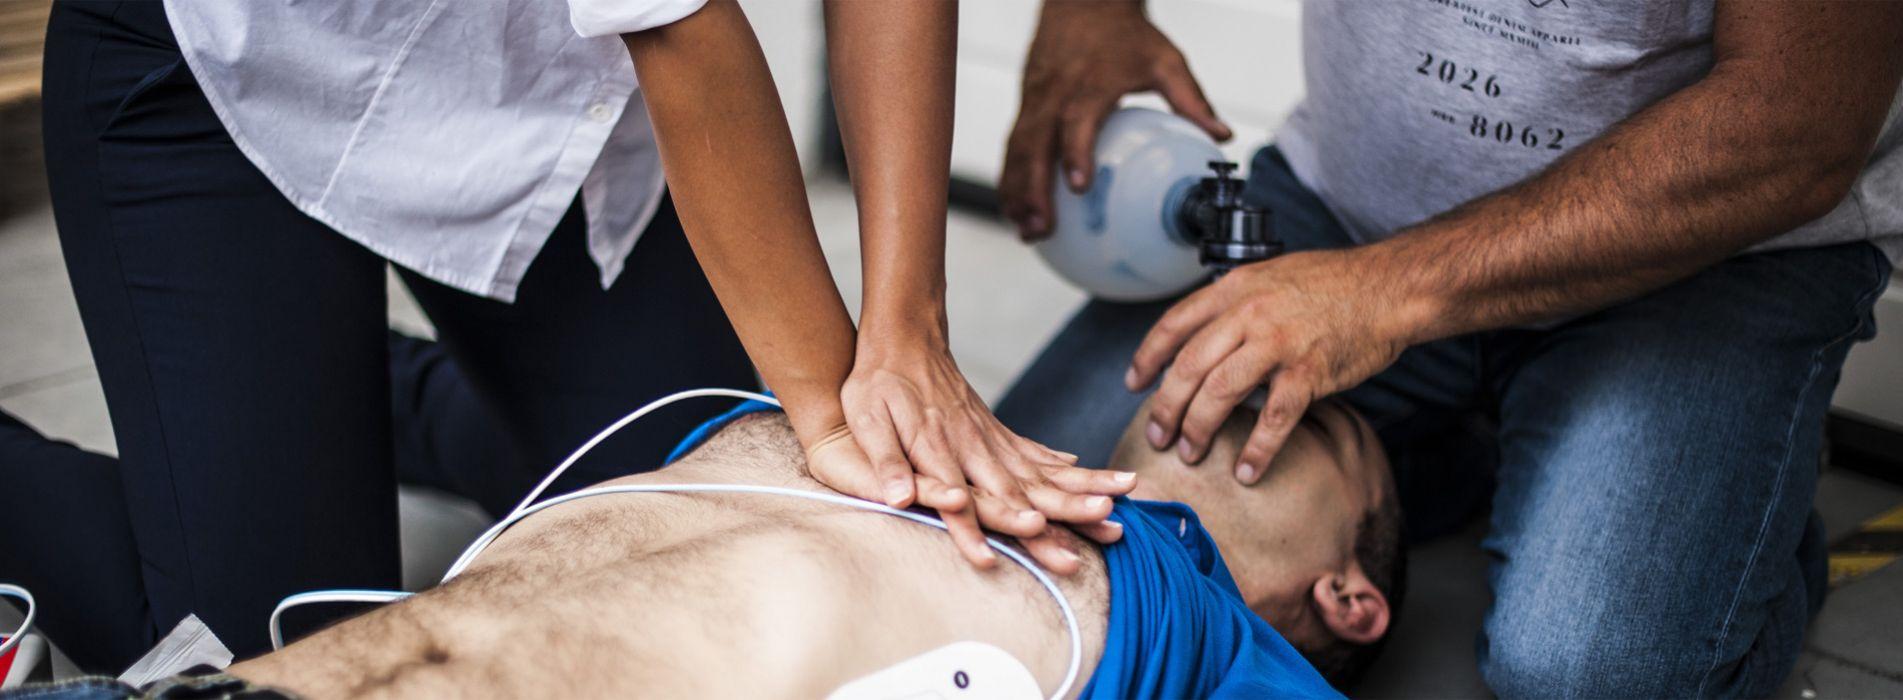 wednesbury first aid training